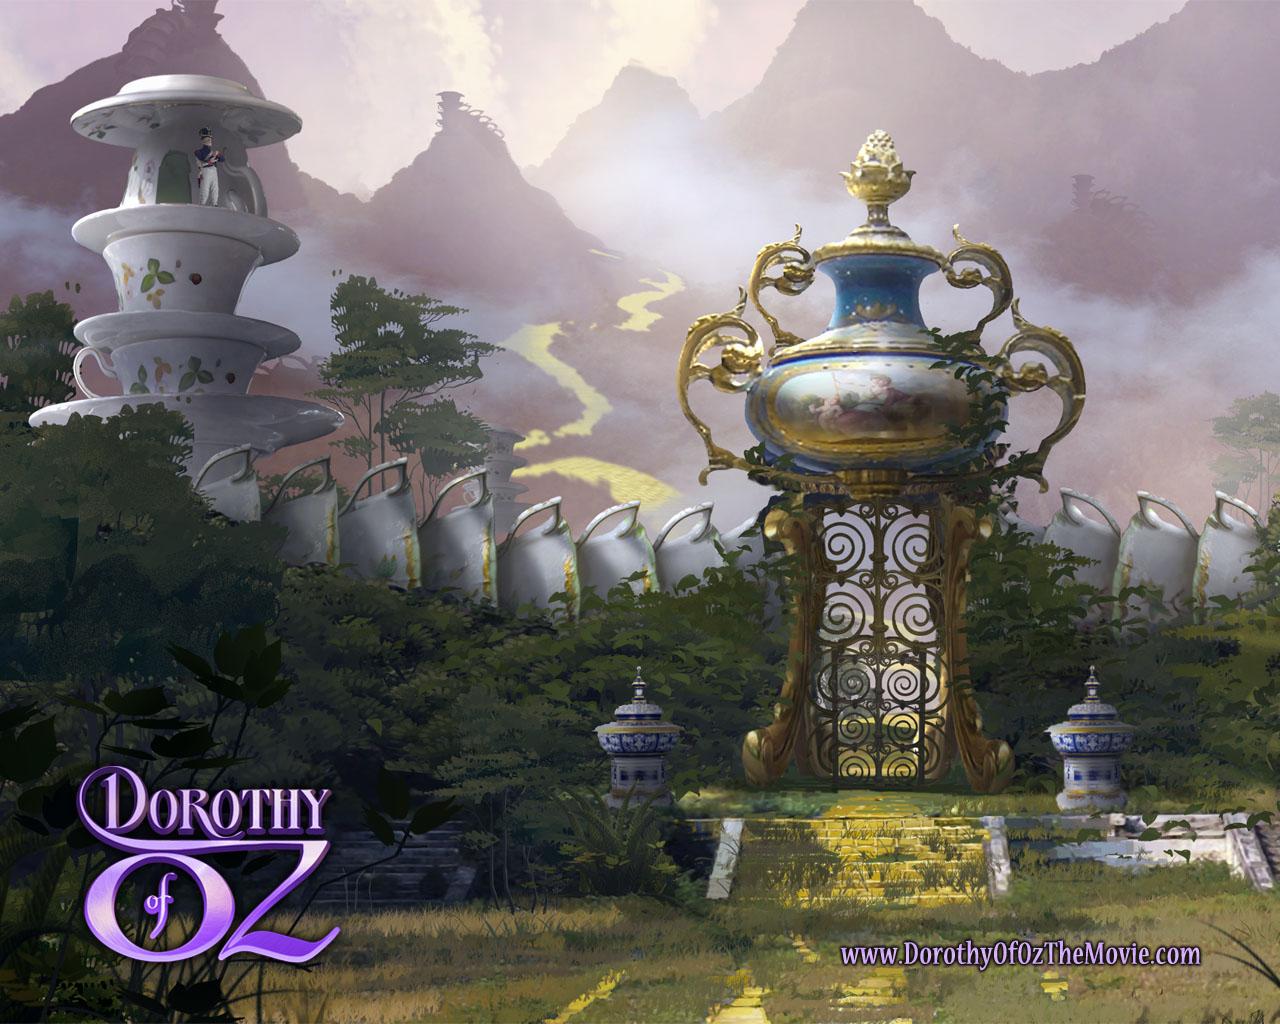 http://st-im.kinopoisk.ru/im/wallpaper/1/5/3/kinopoisk.ru-Legends-of-Oz_3A-Dorothy_27s-Return-1533898--w--1280.jpg